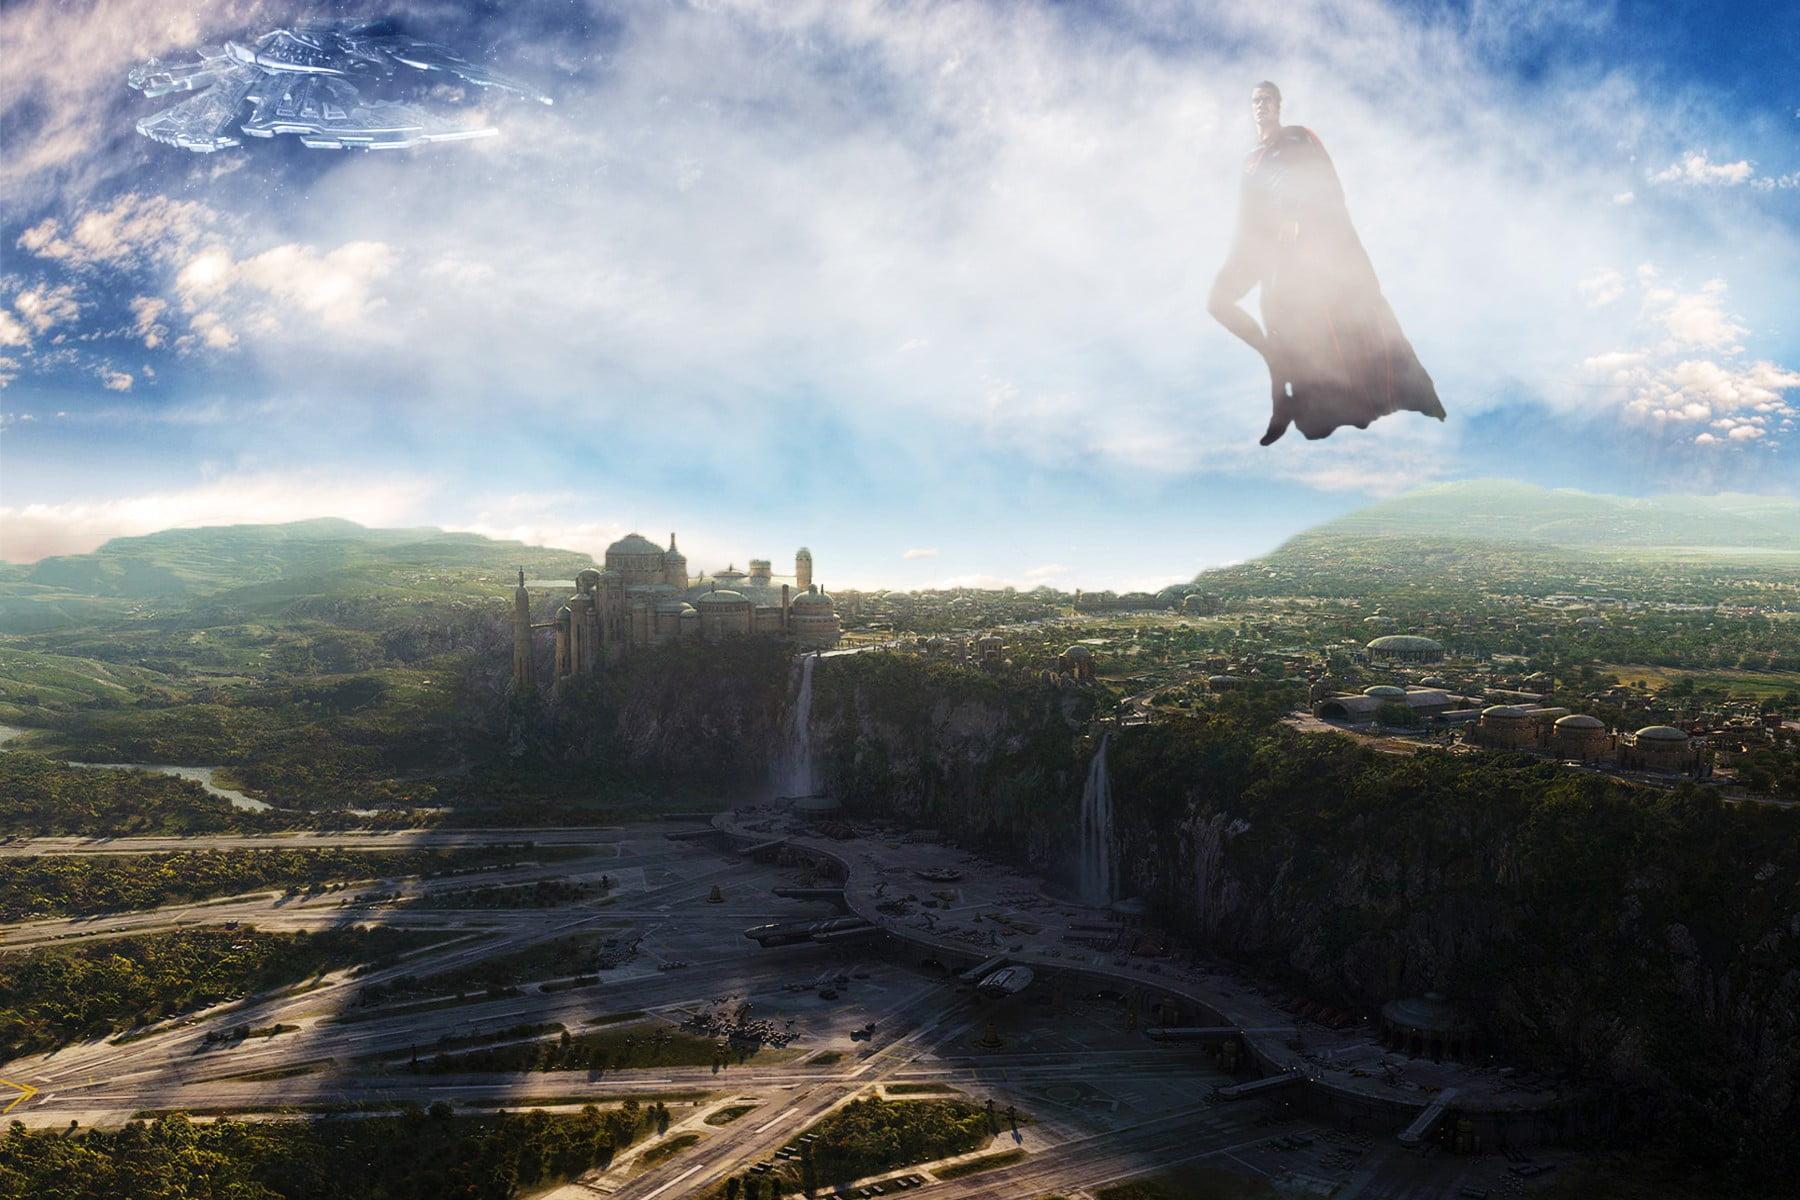 Superman Superman city Naboo HD wallpaper Wallpaper Flare 1800x1200